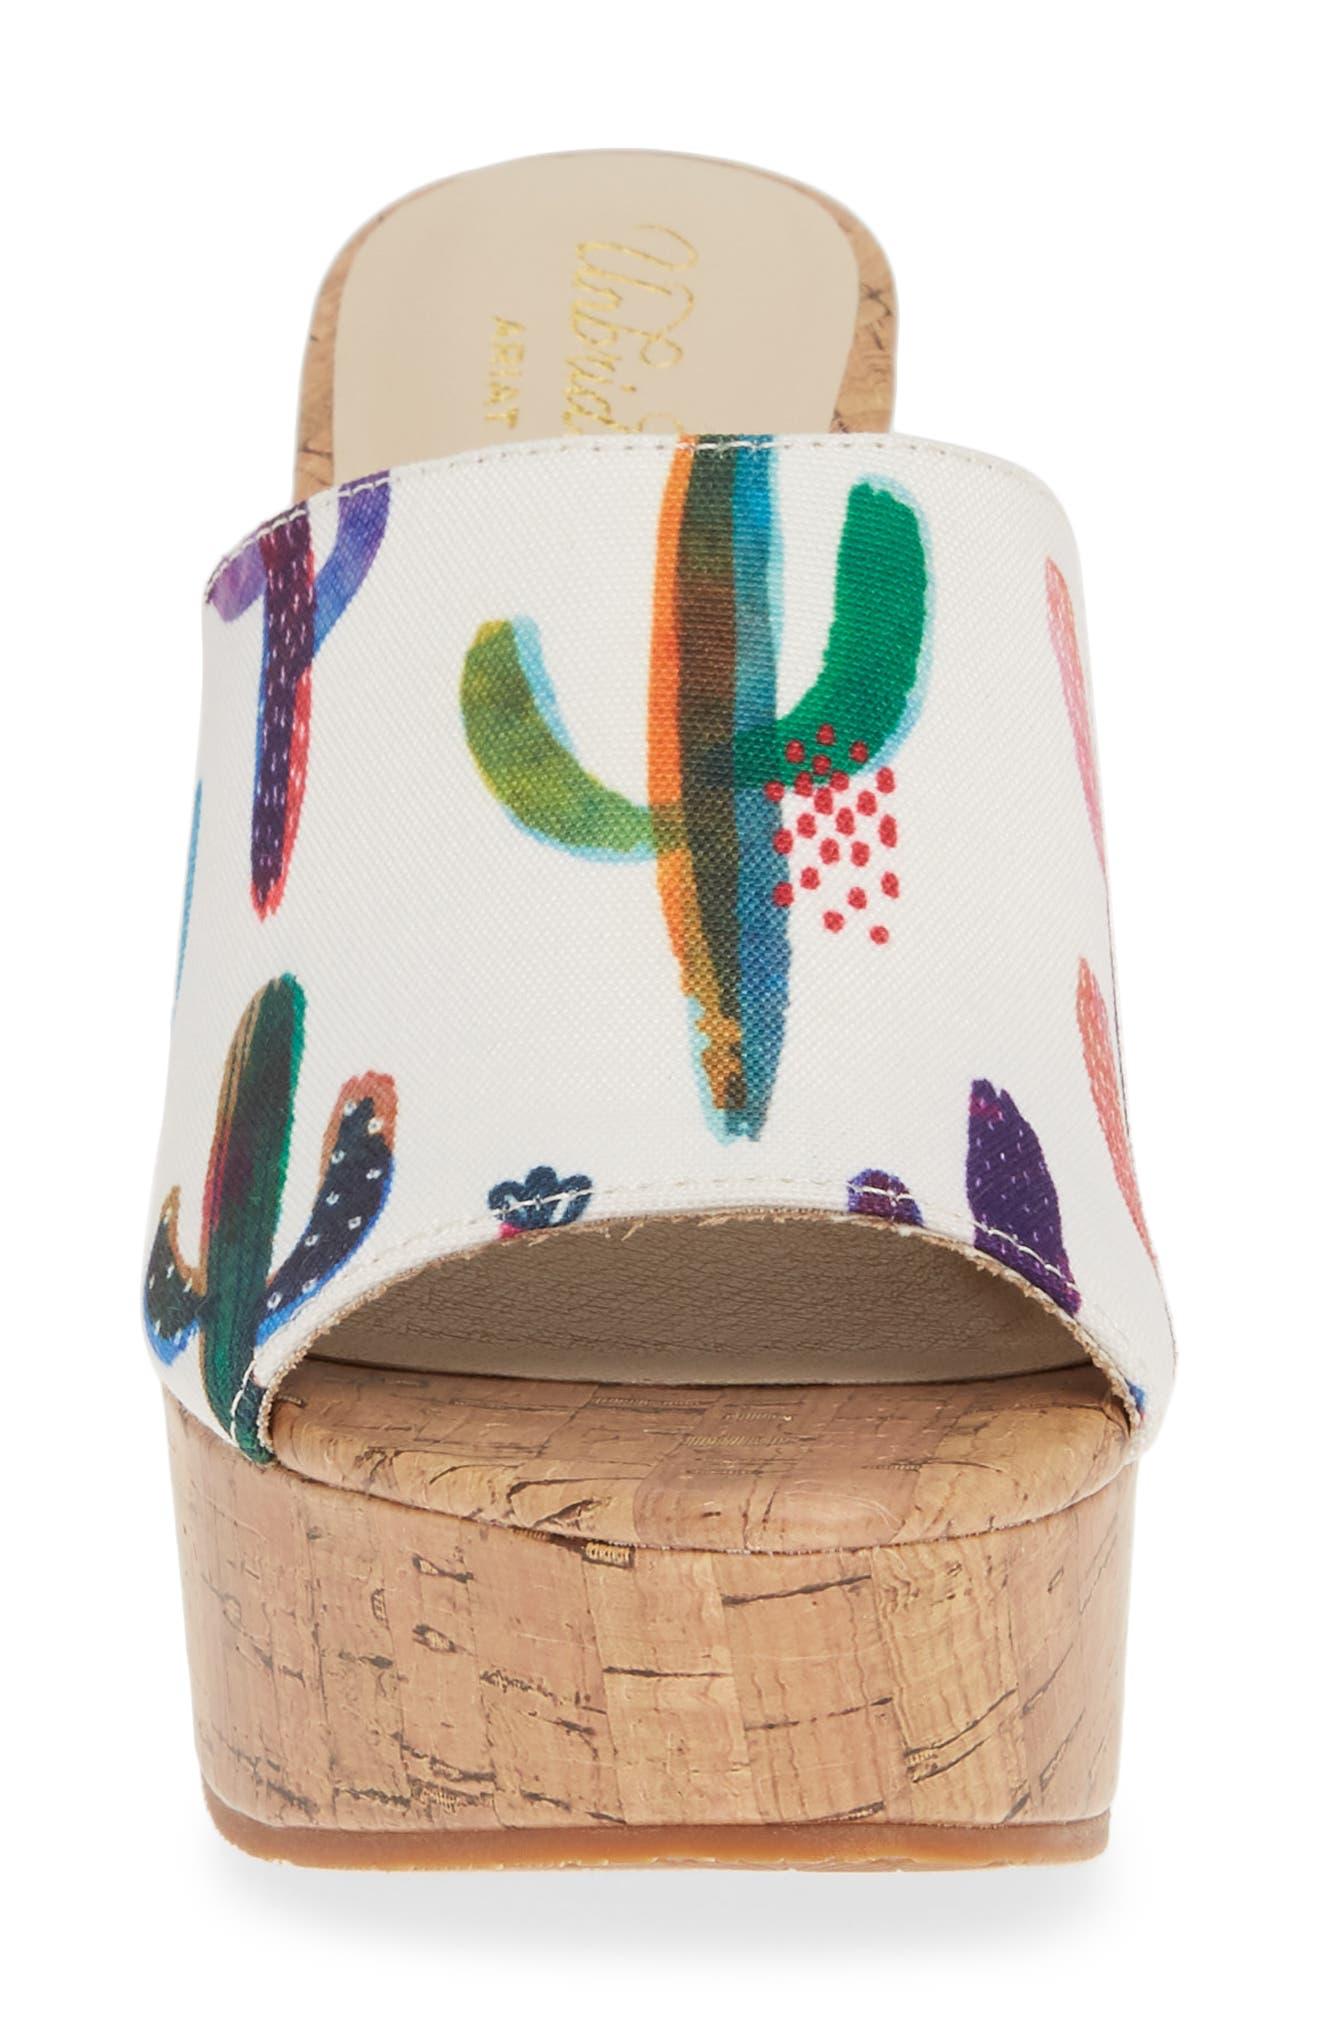 ARIAT, Layla Wedge Slide Sandal, Alternate thumbnail 4, color, CACTUS PRINT FABRIC